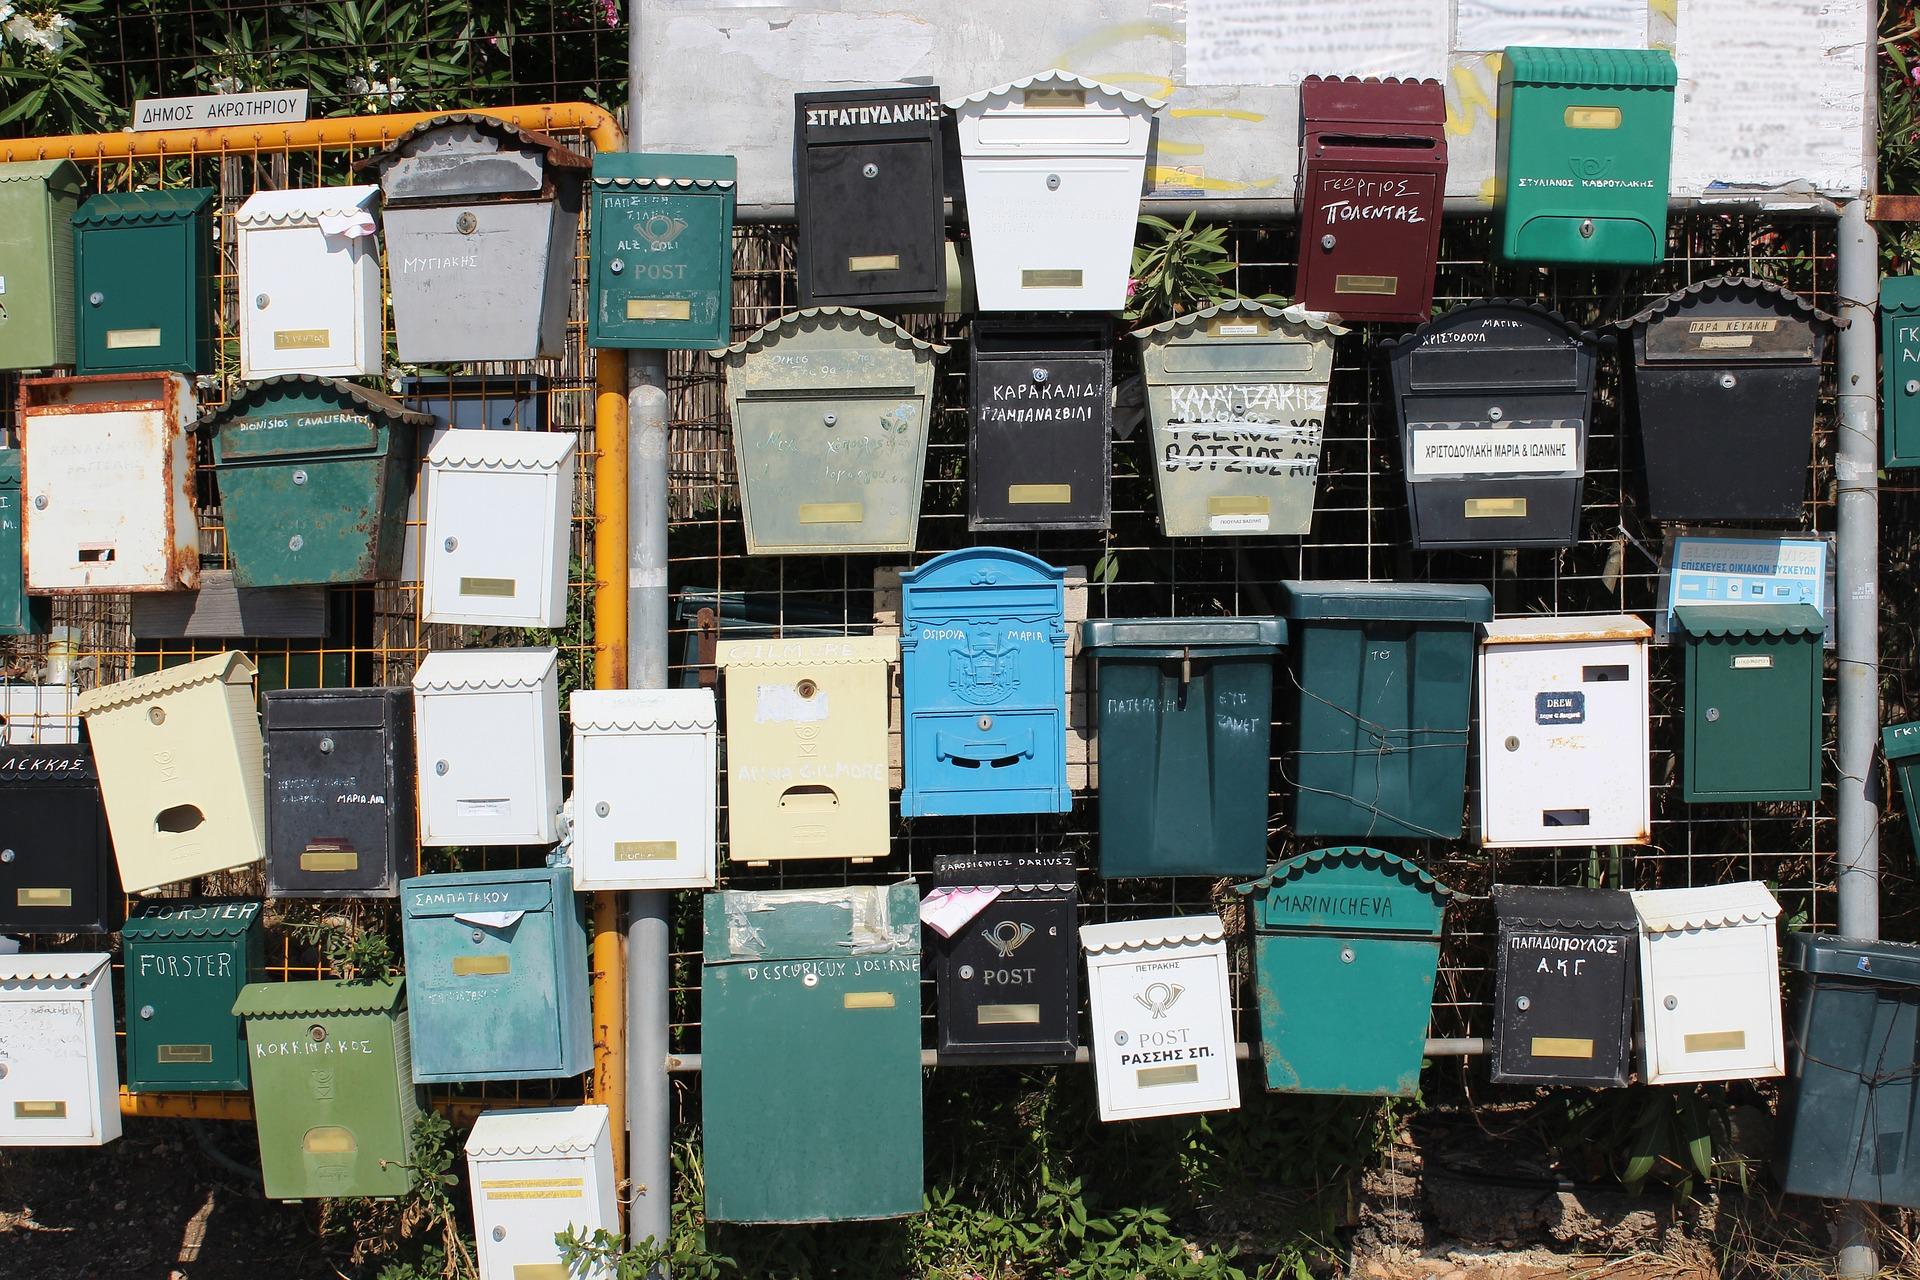 Briefkasten, (c) pixabay.com